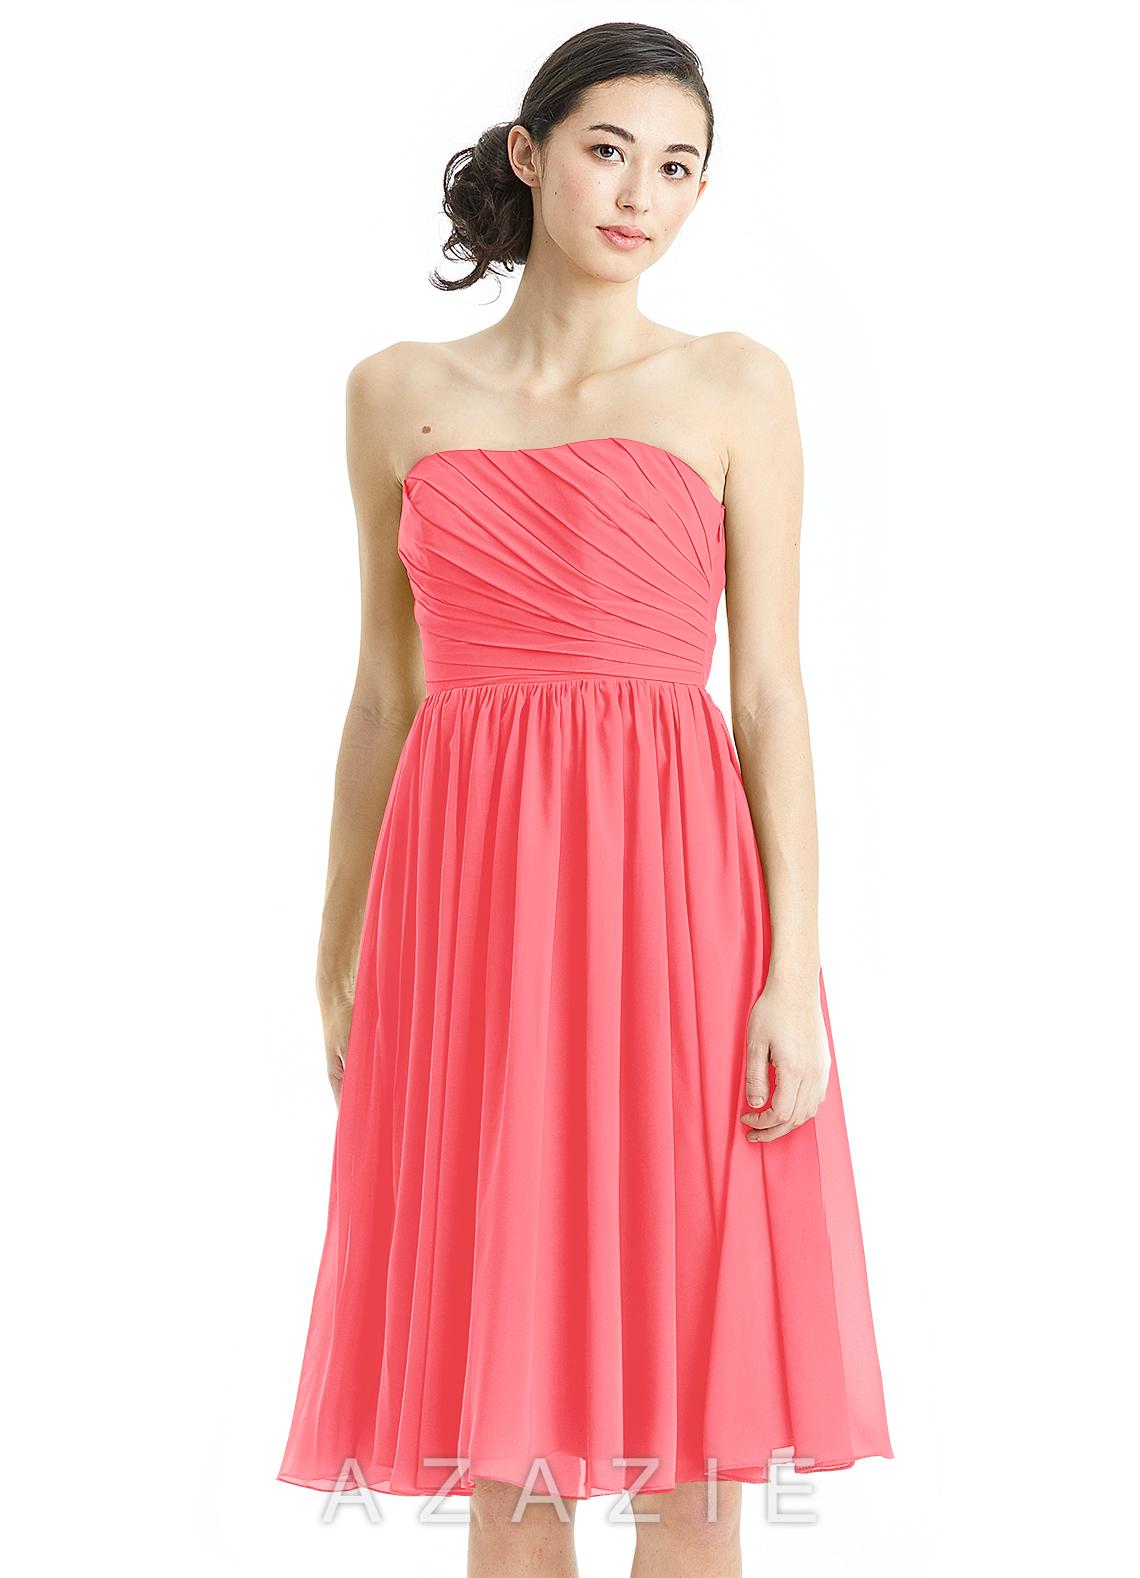 Azazie katie bridesmaid dress azazie color watermelon ombrellifo Image collections